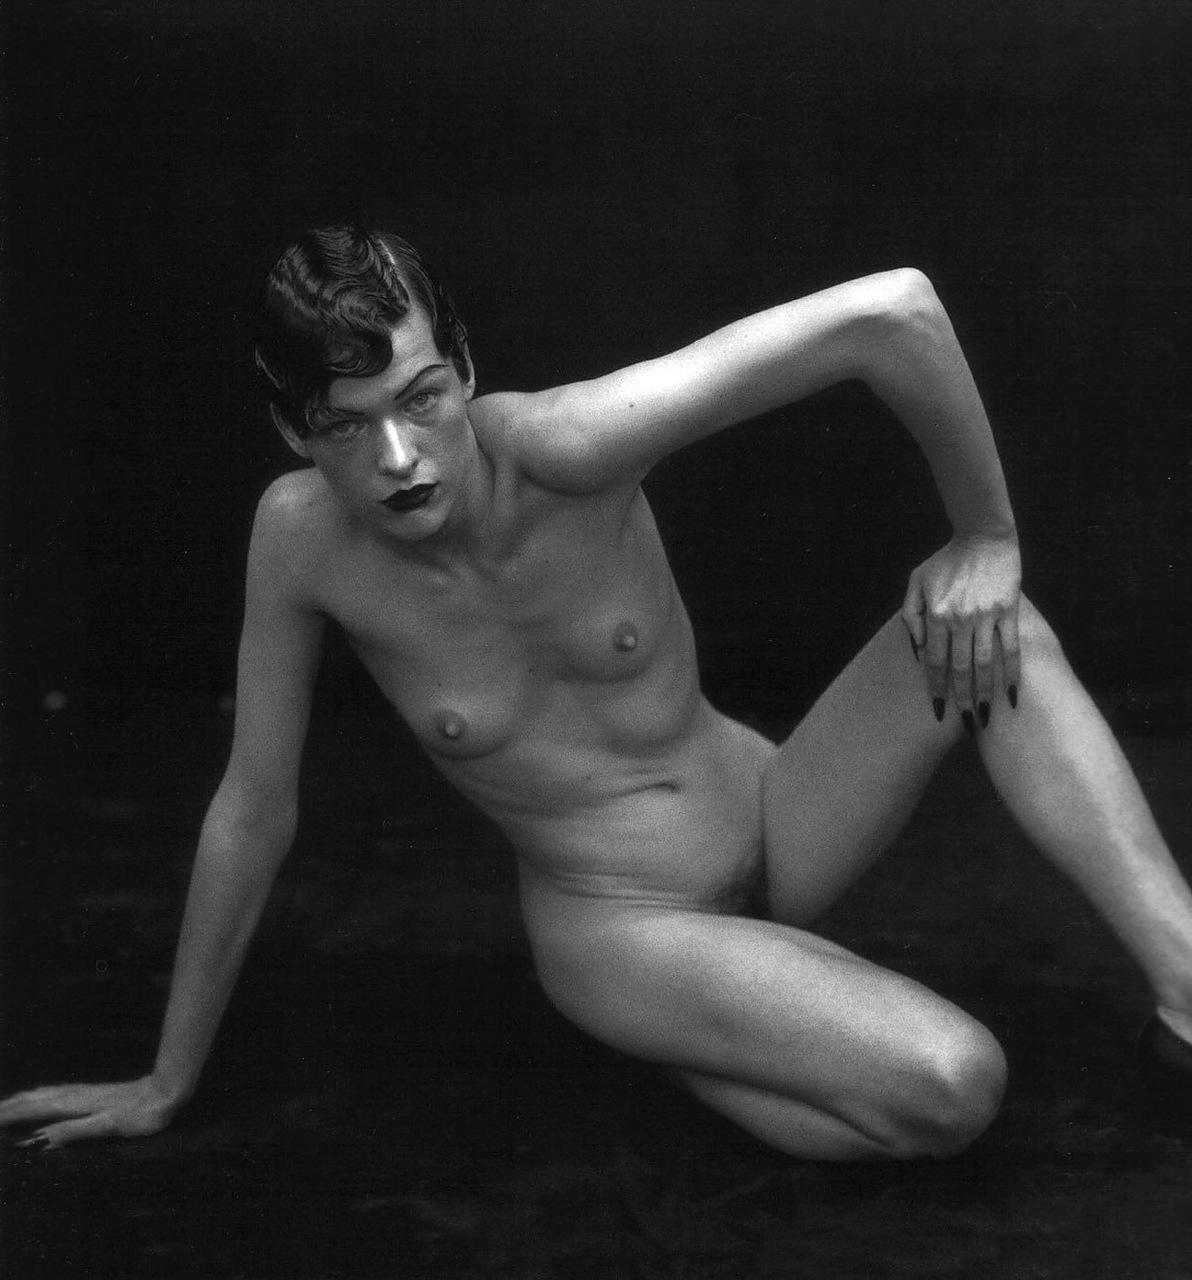 Milla Jovovich desnuda - Página 11 fotos desnuda,